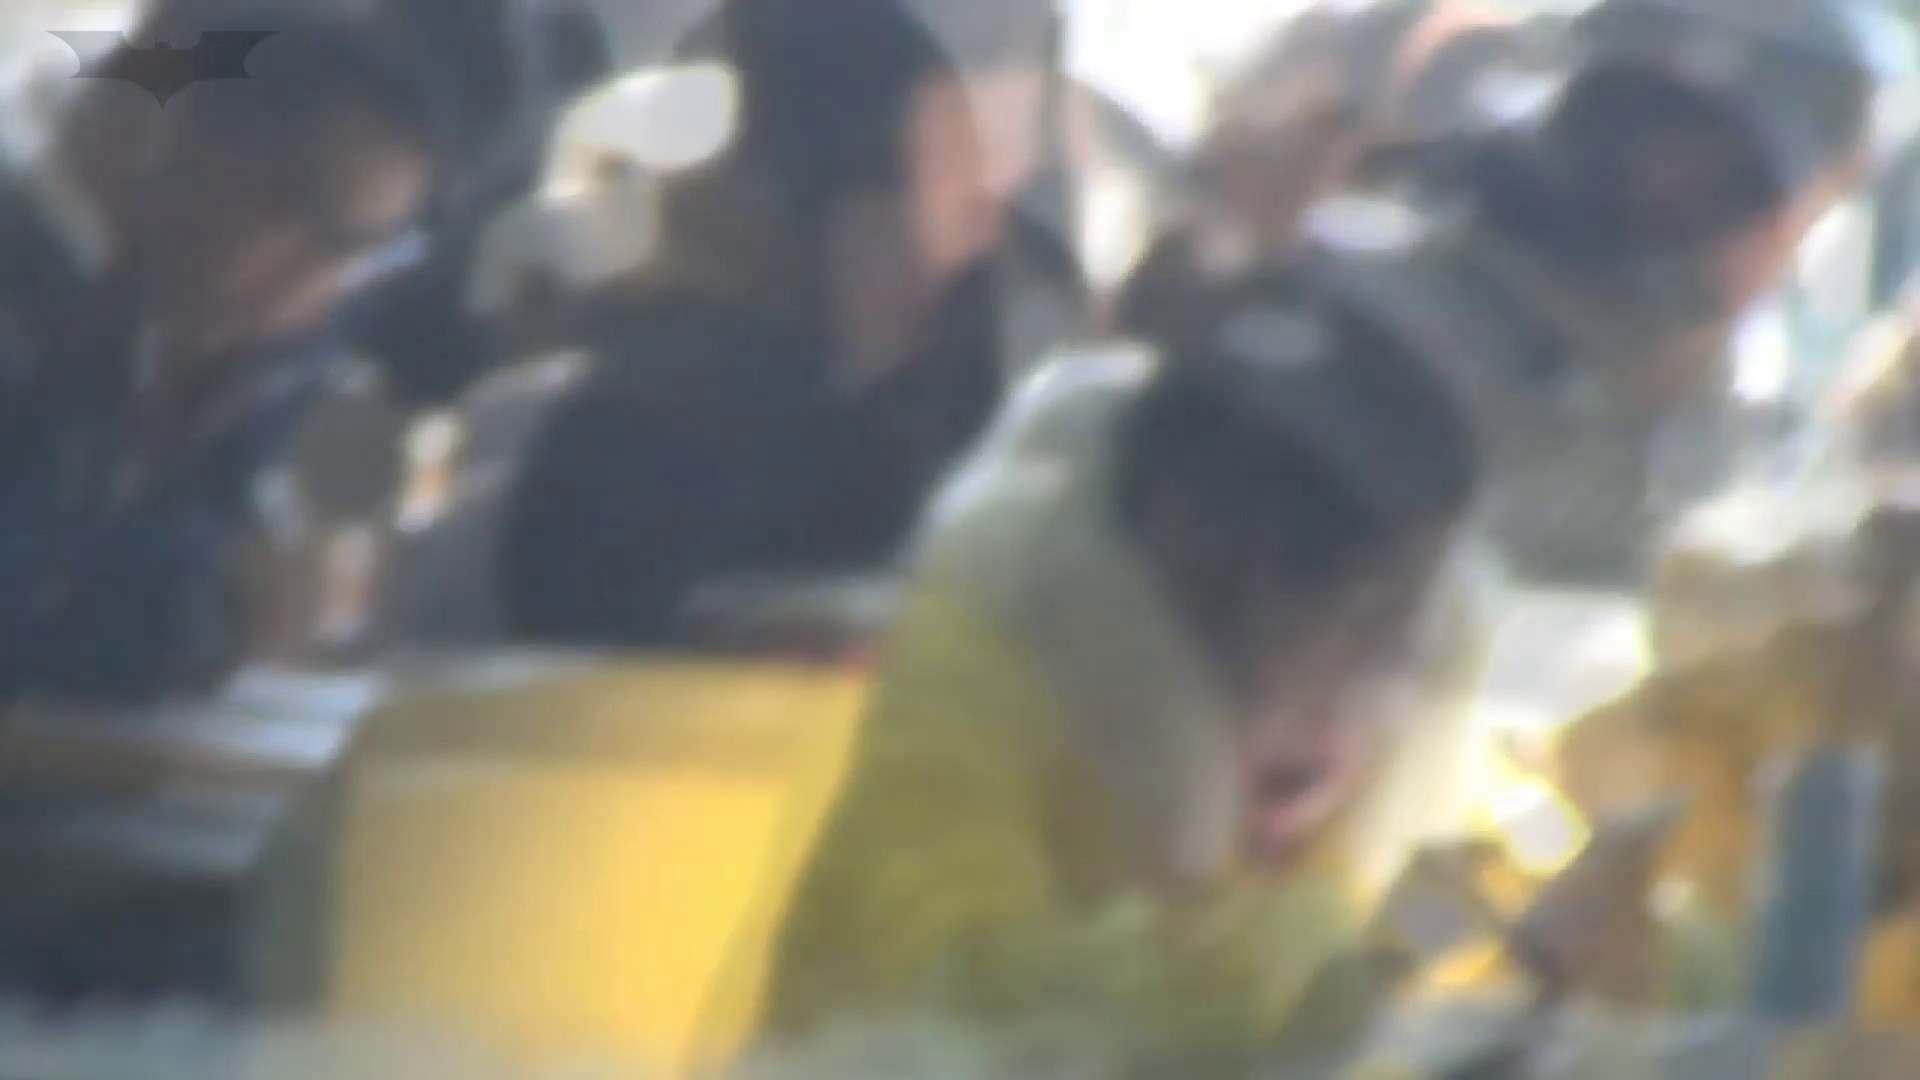 JD盗撮 美女の洗面所の秘密 Vol.26 盗撮 ぱこり動画紹介 73PIX 8